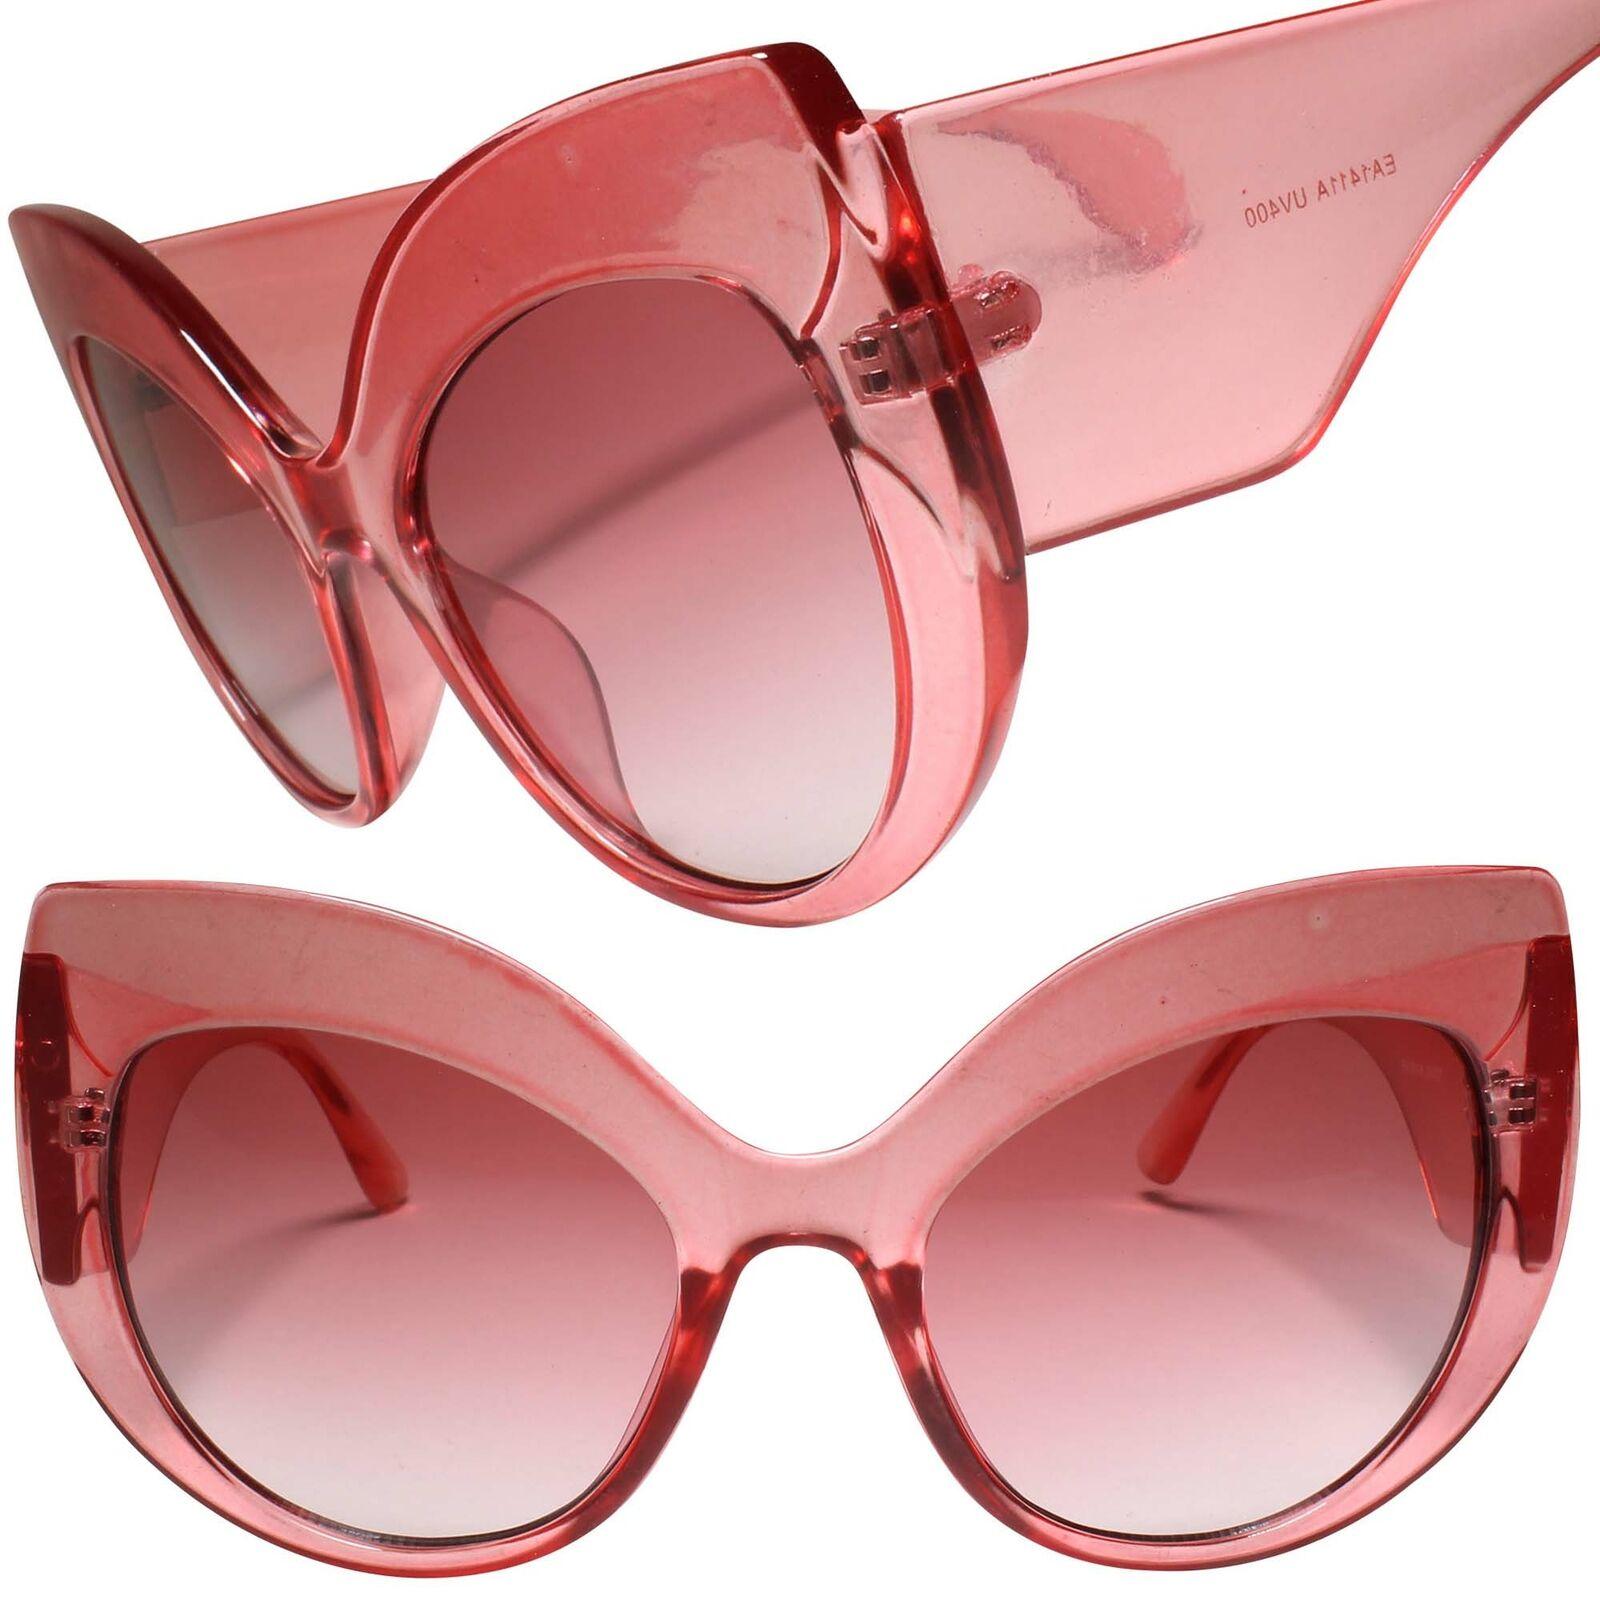 Classic Retro Rockabilly Oversized Fashion Womens Cat Eye Pink Sunglasses